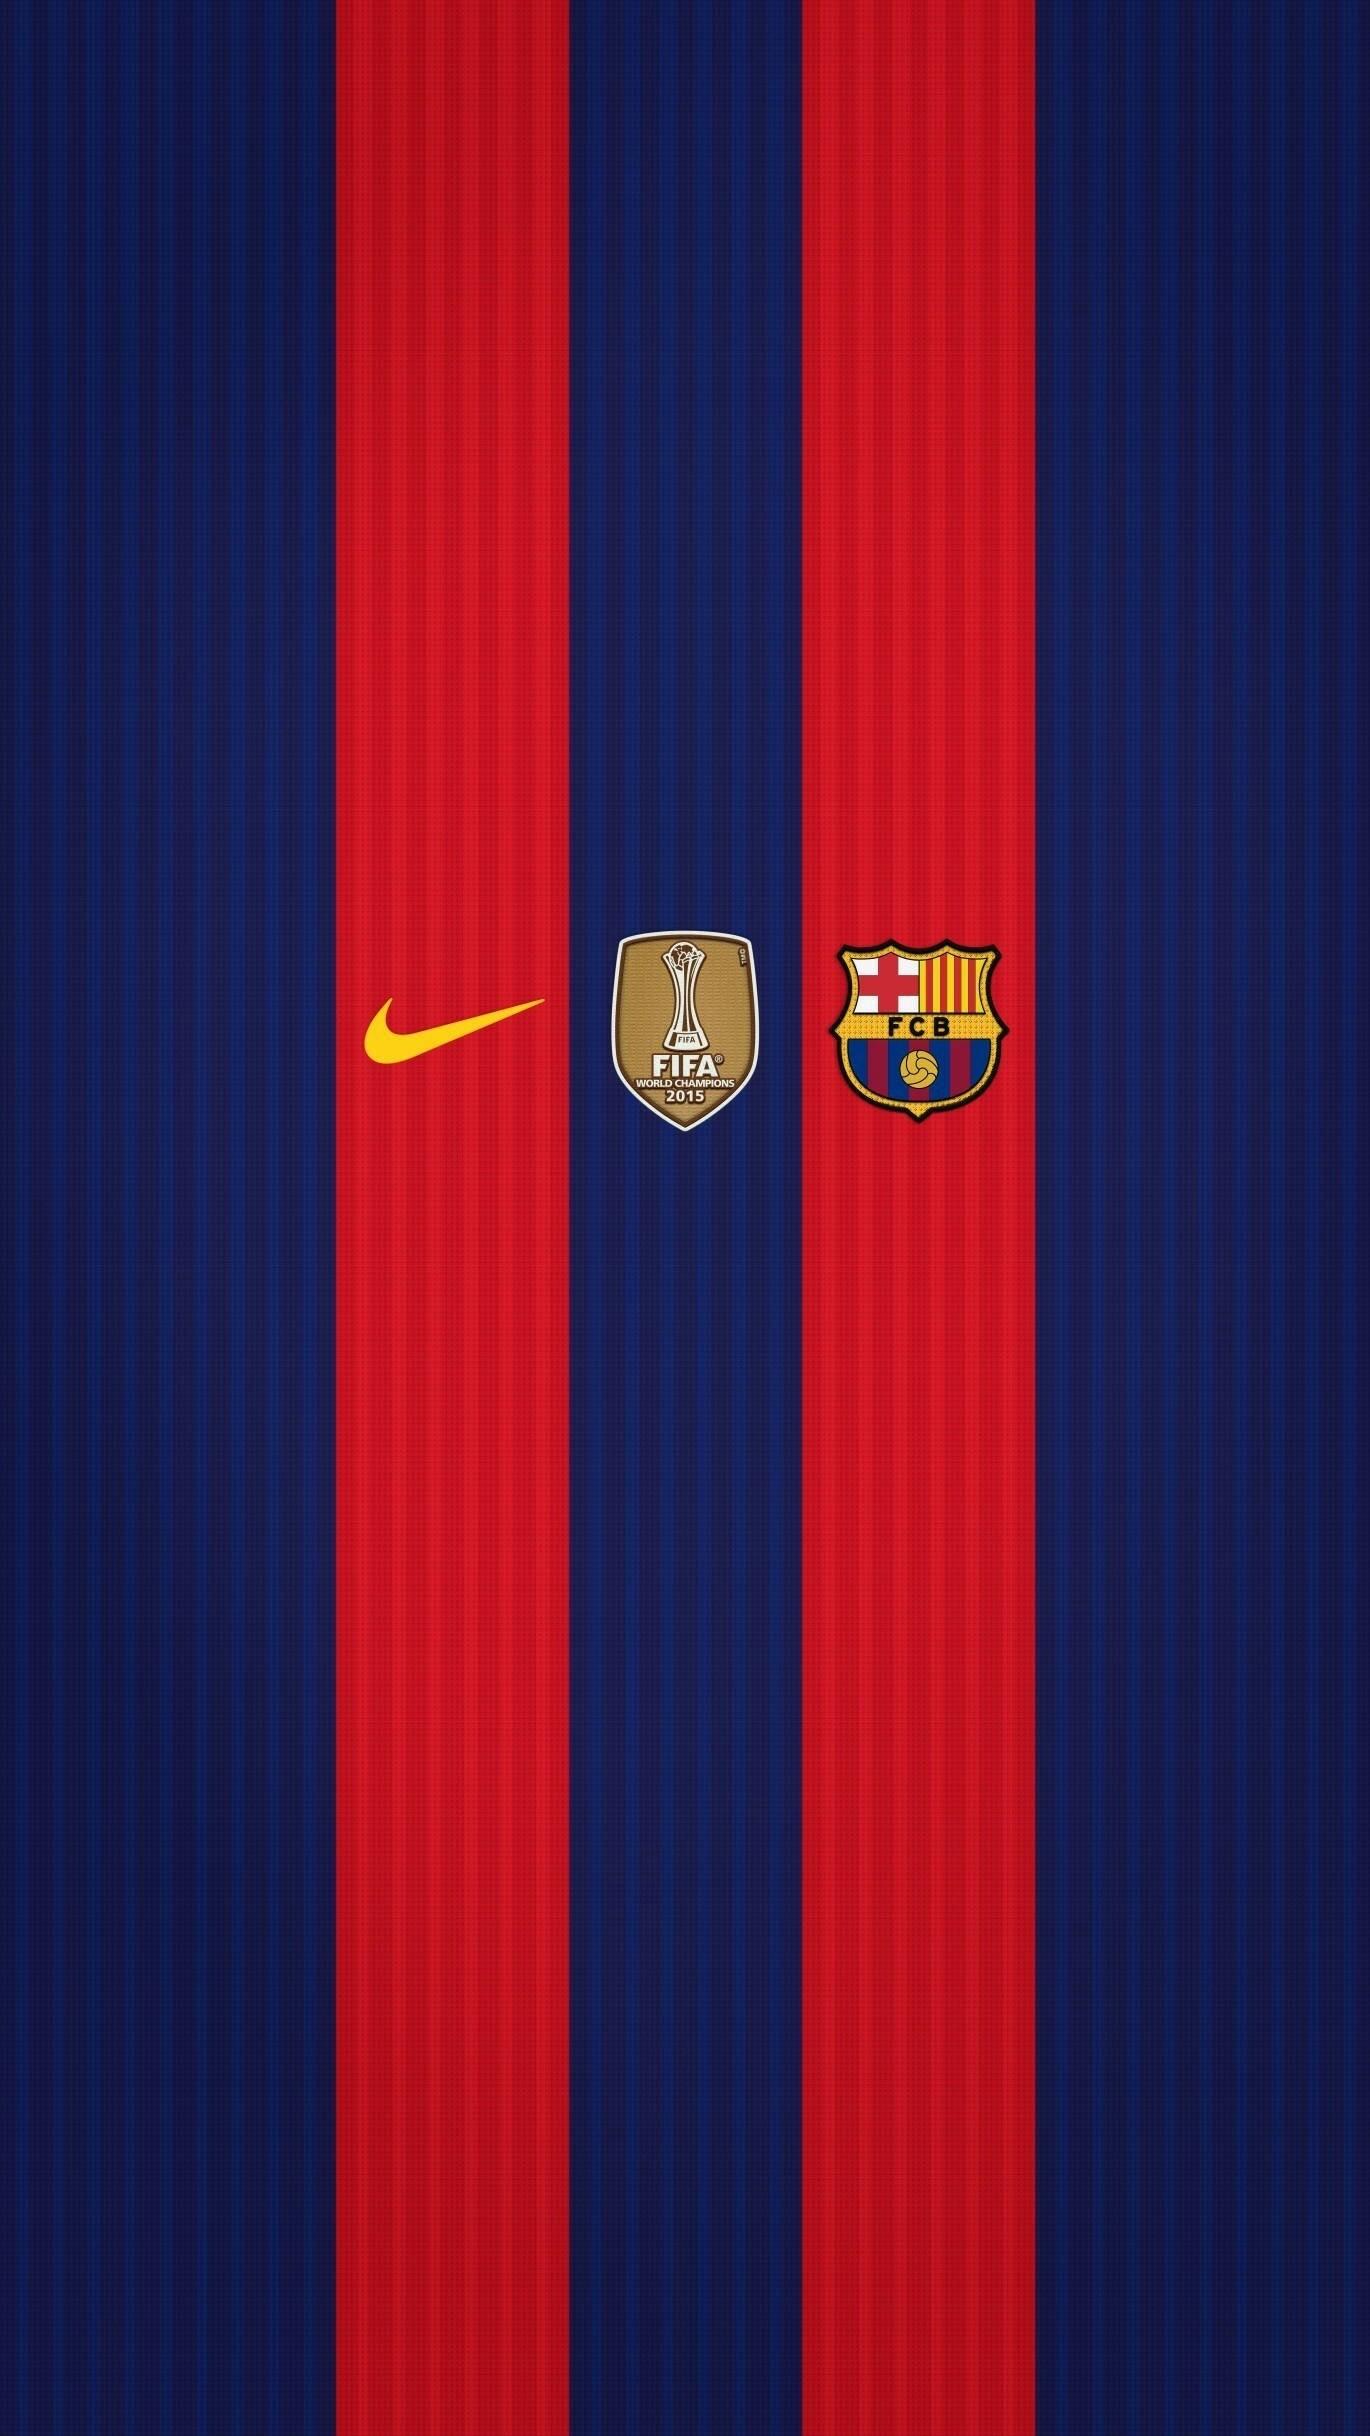 Barca Fans Wallpaper 79 Images